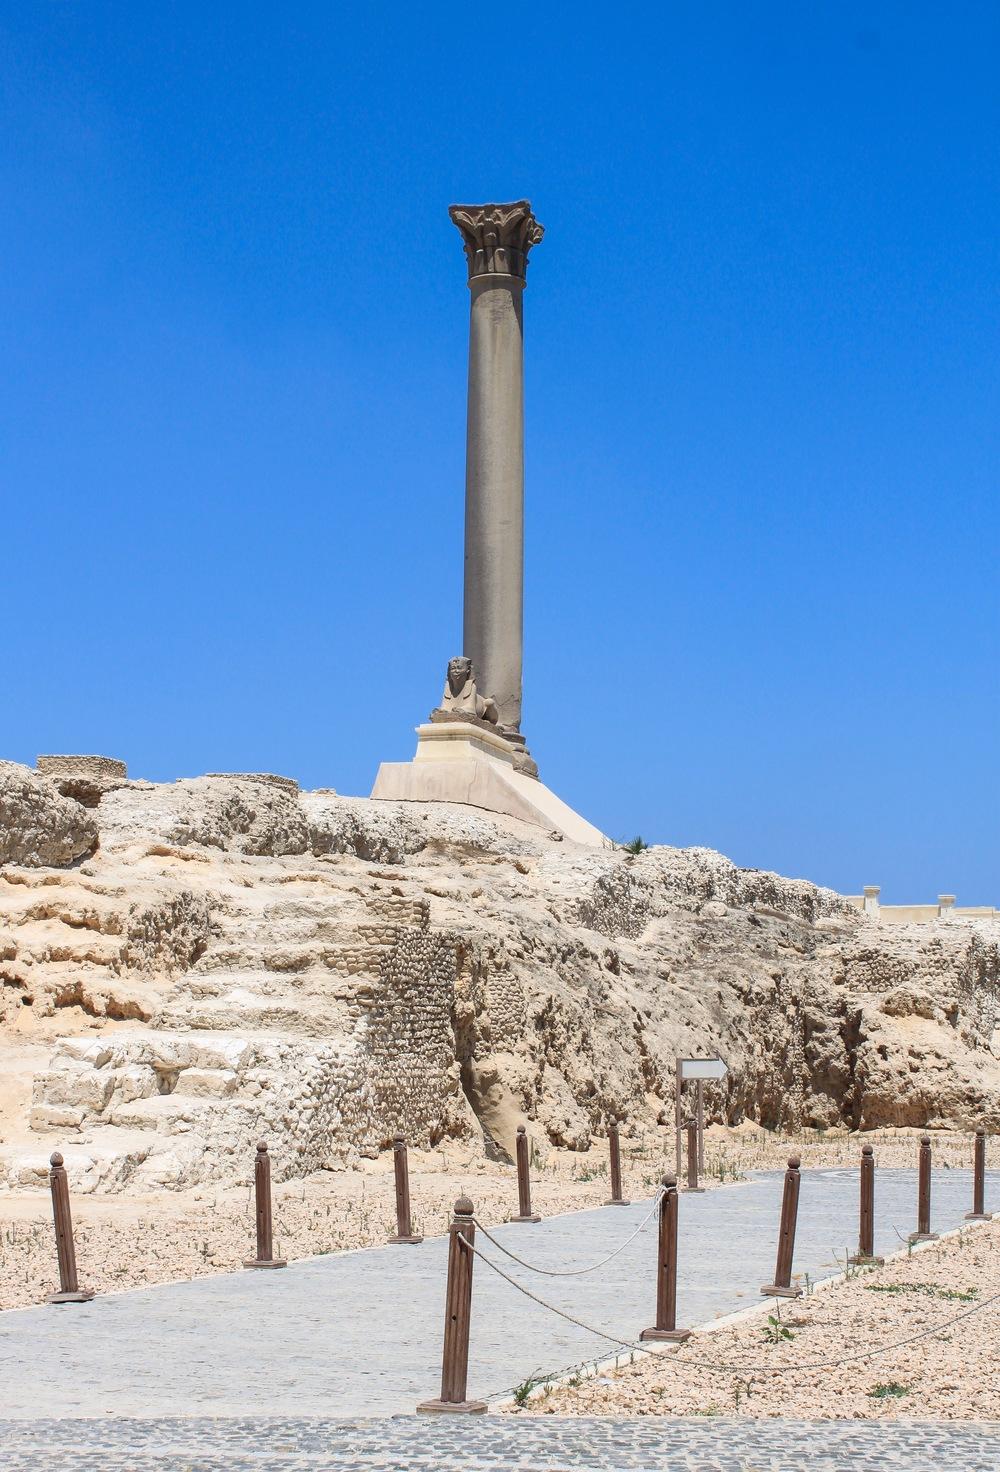 View of Pompey's Pillar